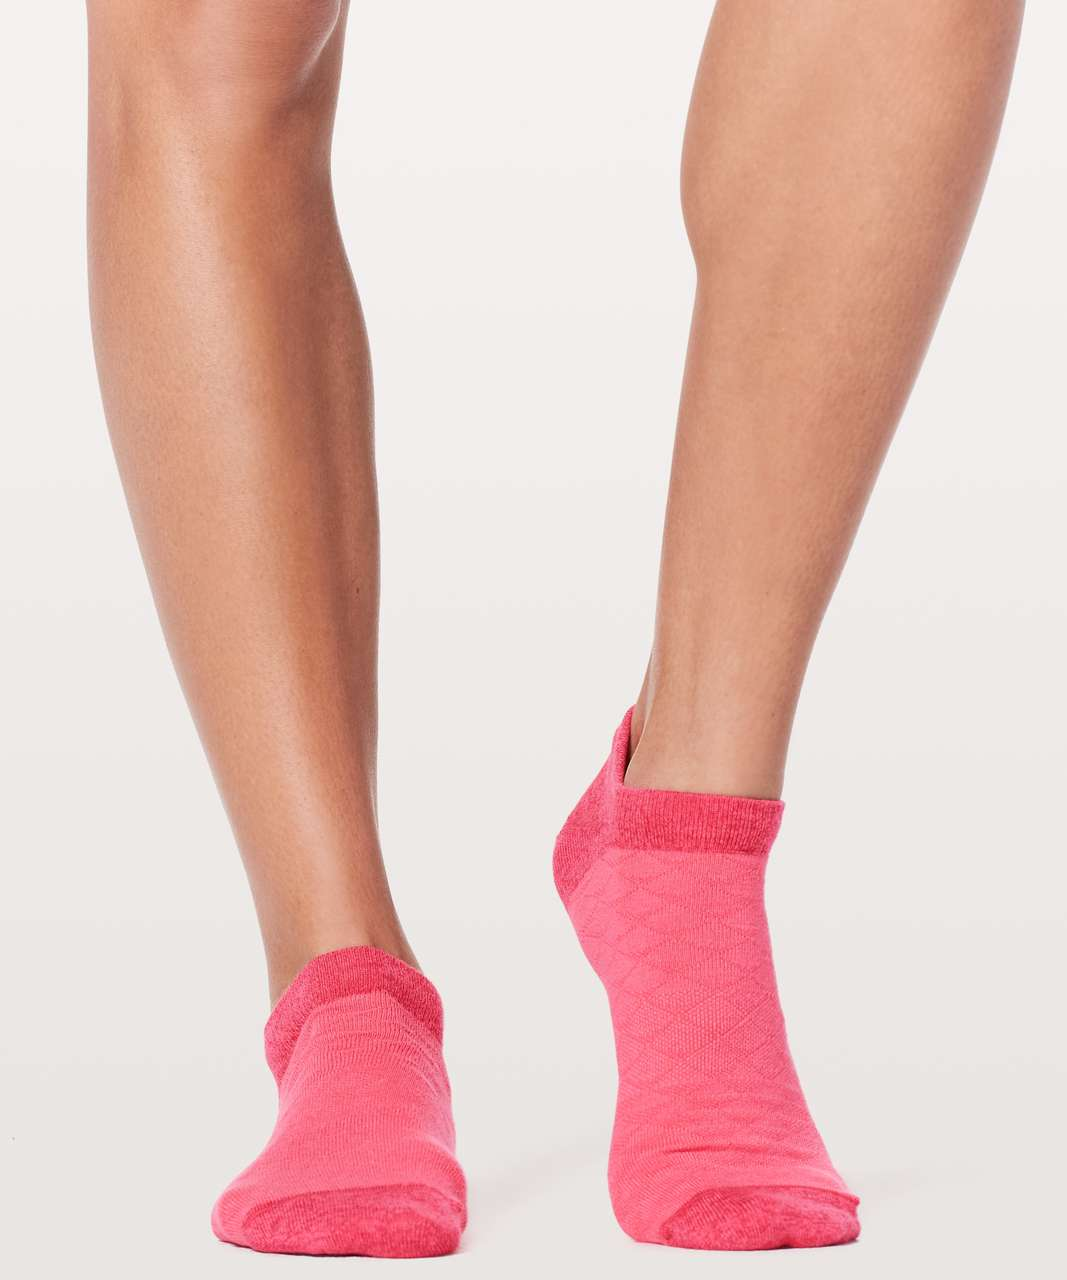 Lululemon On The Fly Sock *Mountain - Glossy / Fuchsia Pink